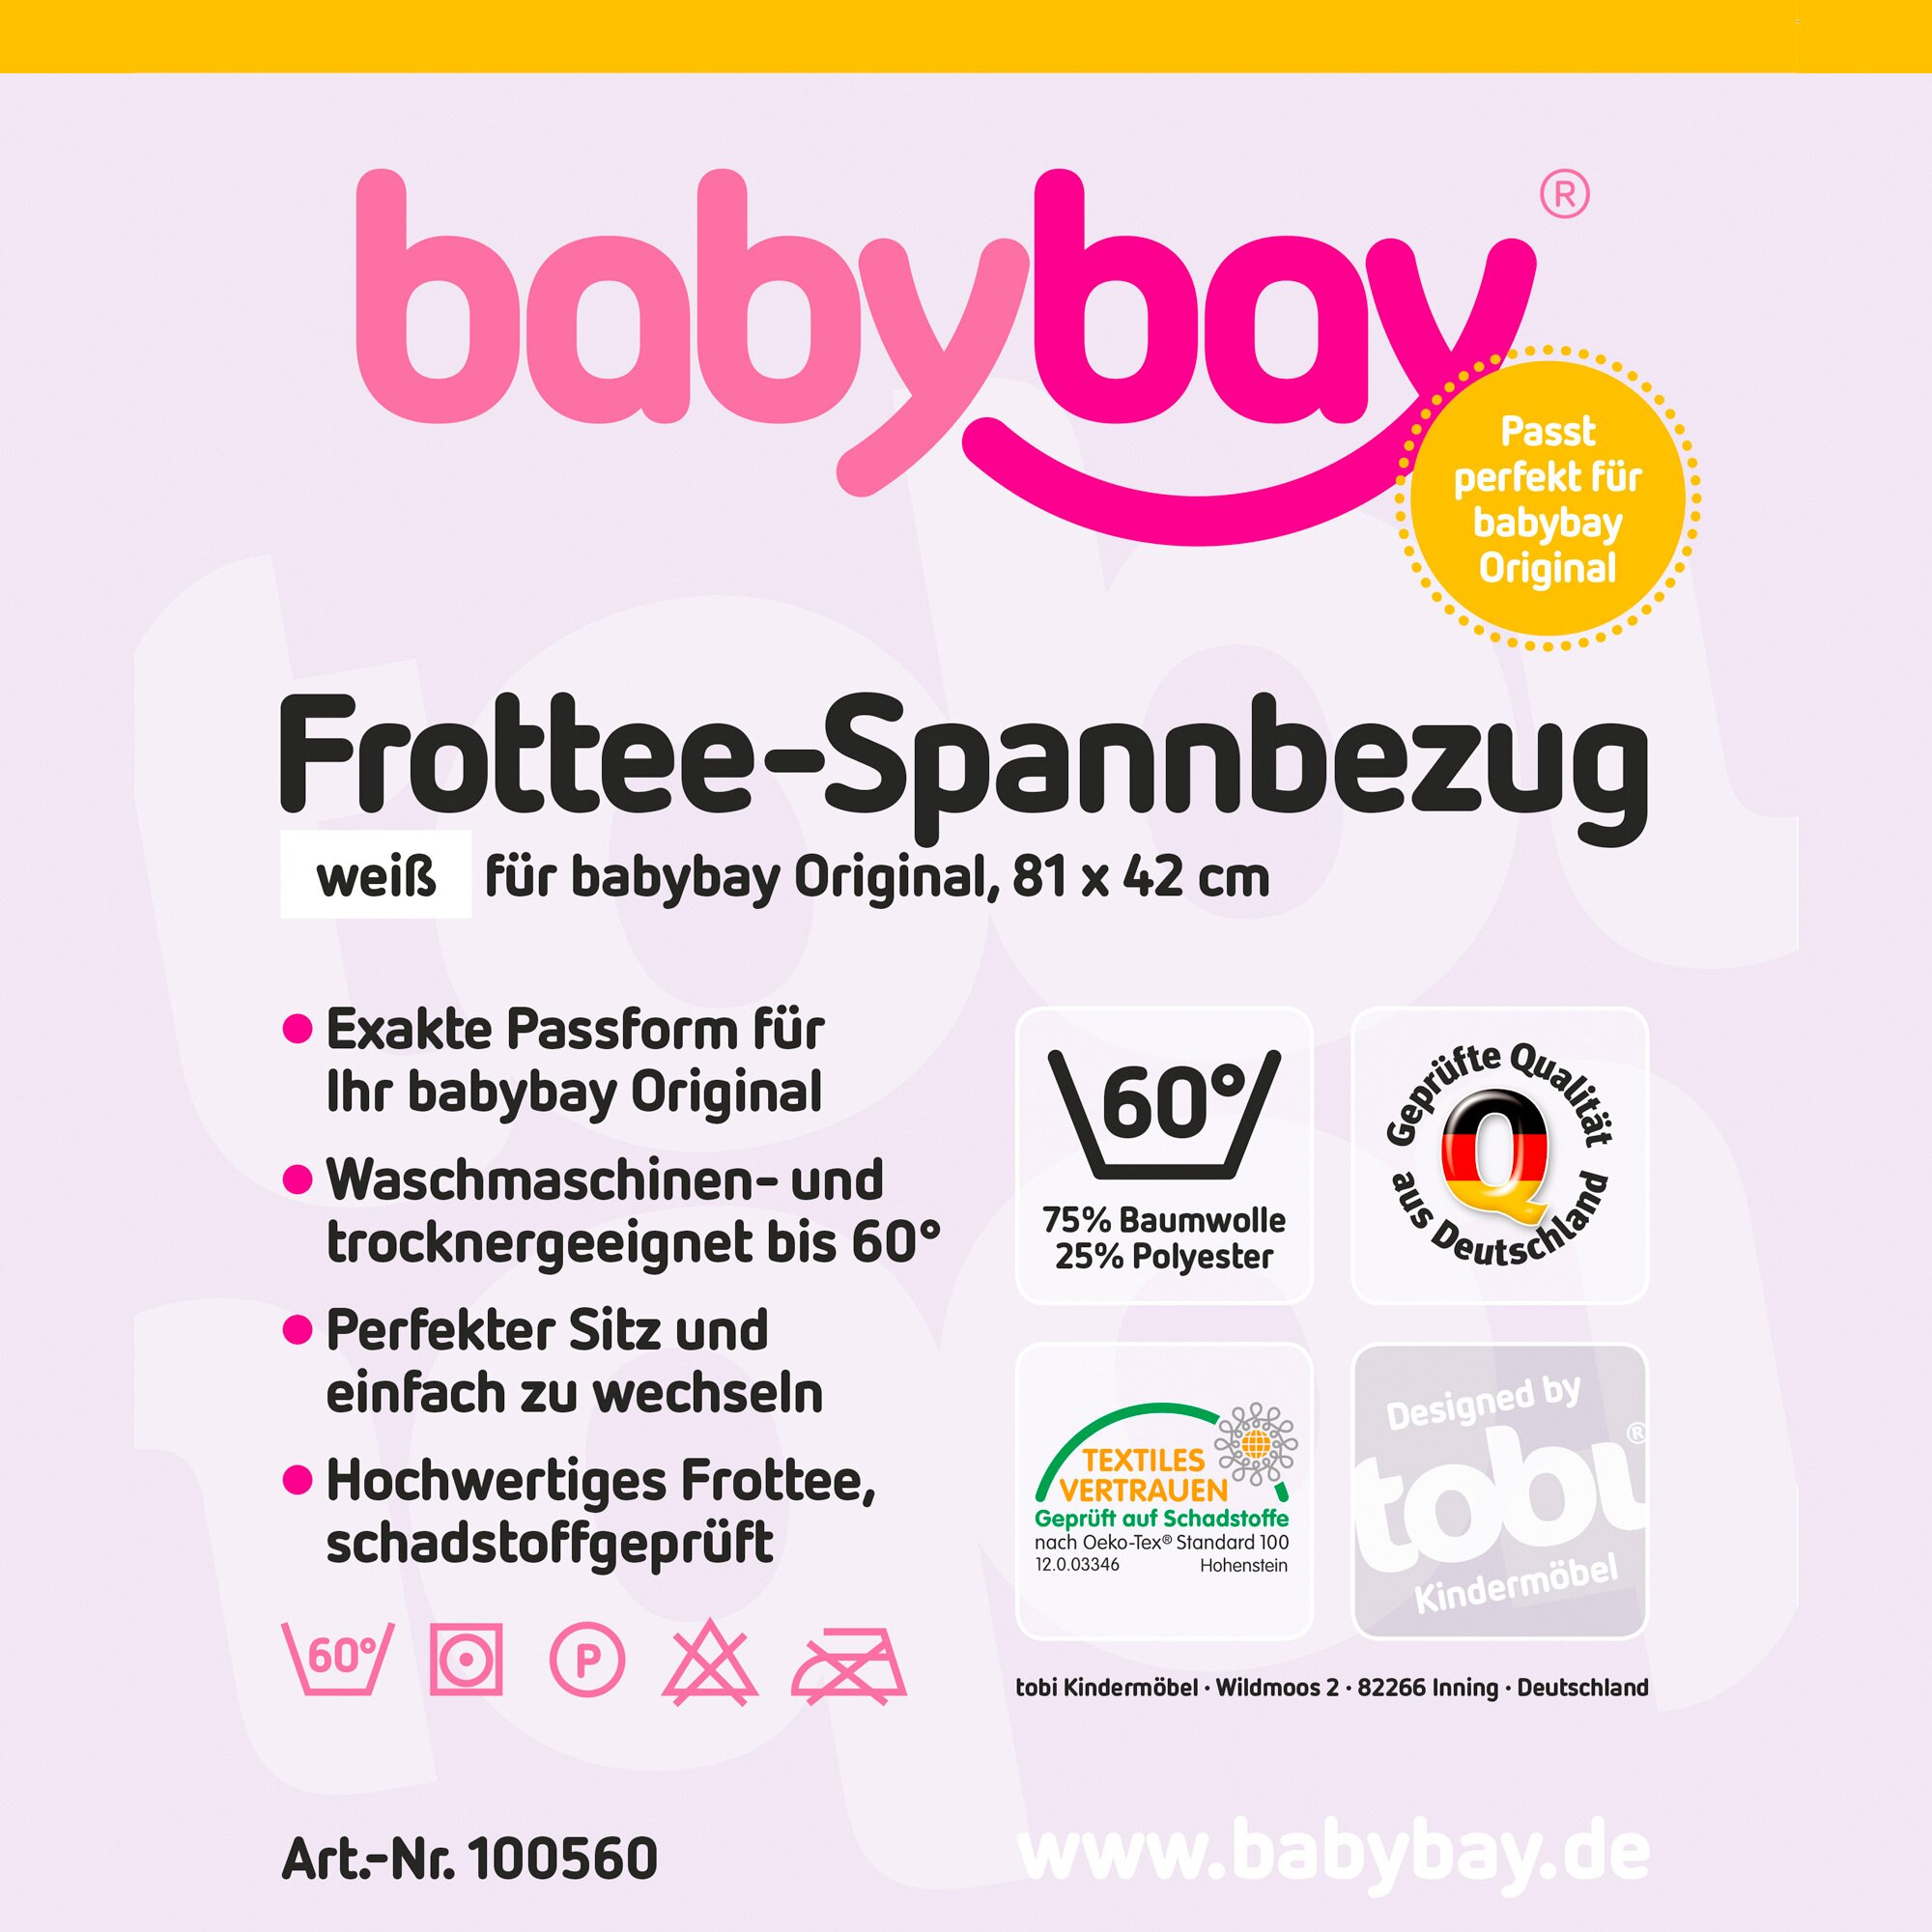 babybay-frottee-spannbetttuch-original-81x42-cm-weiss